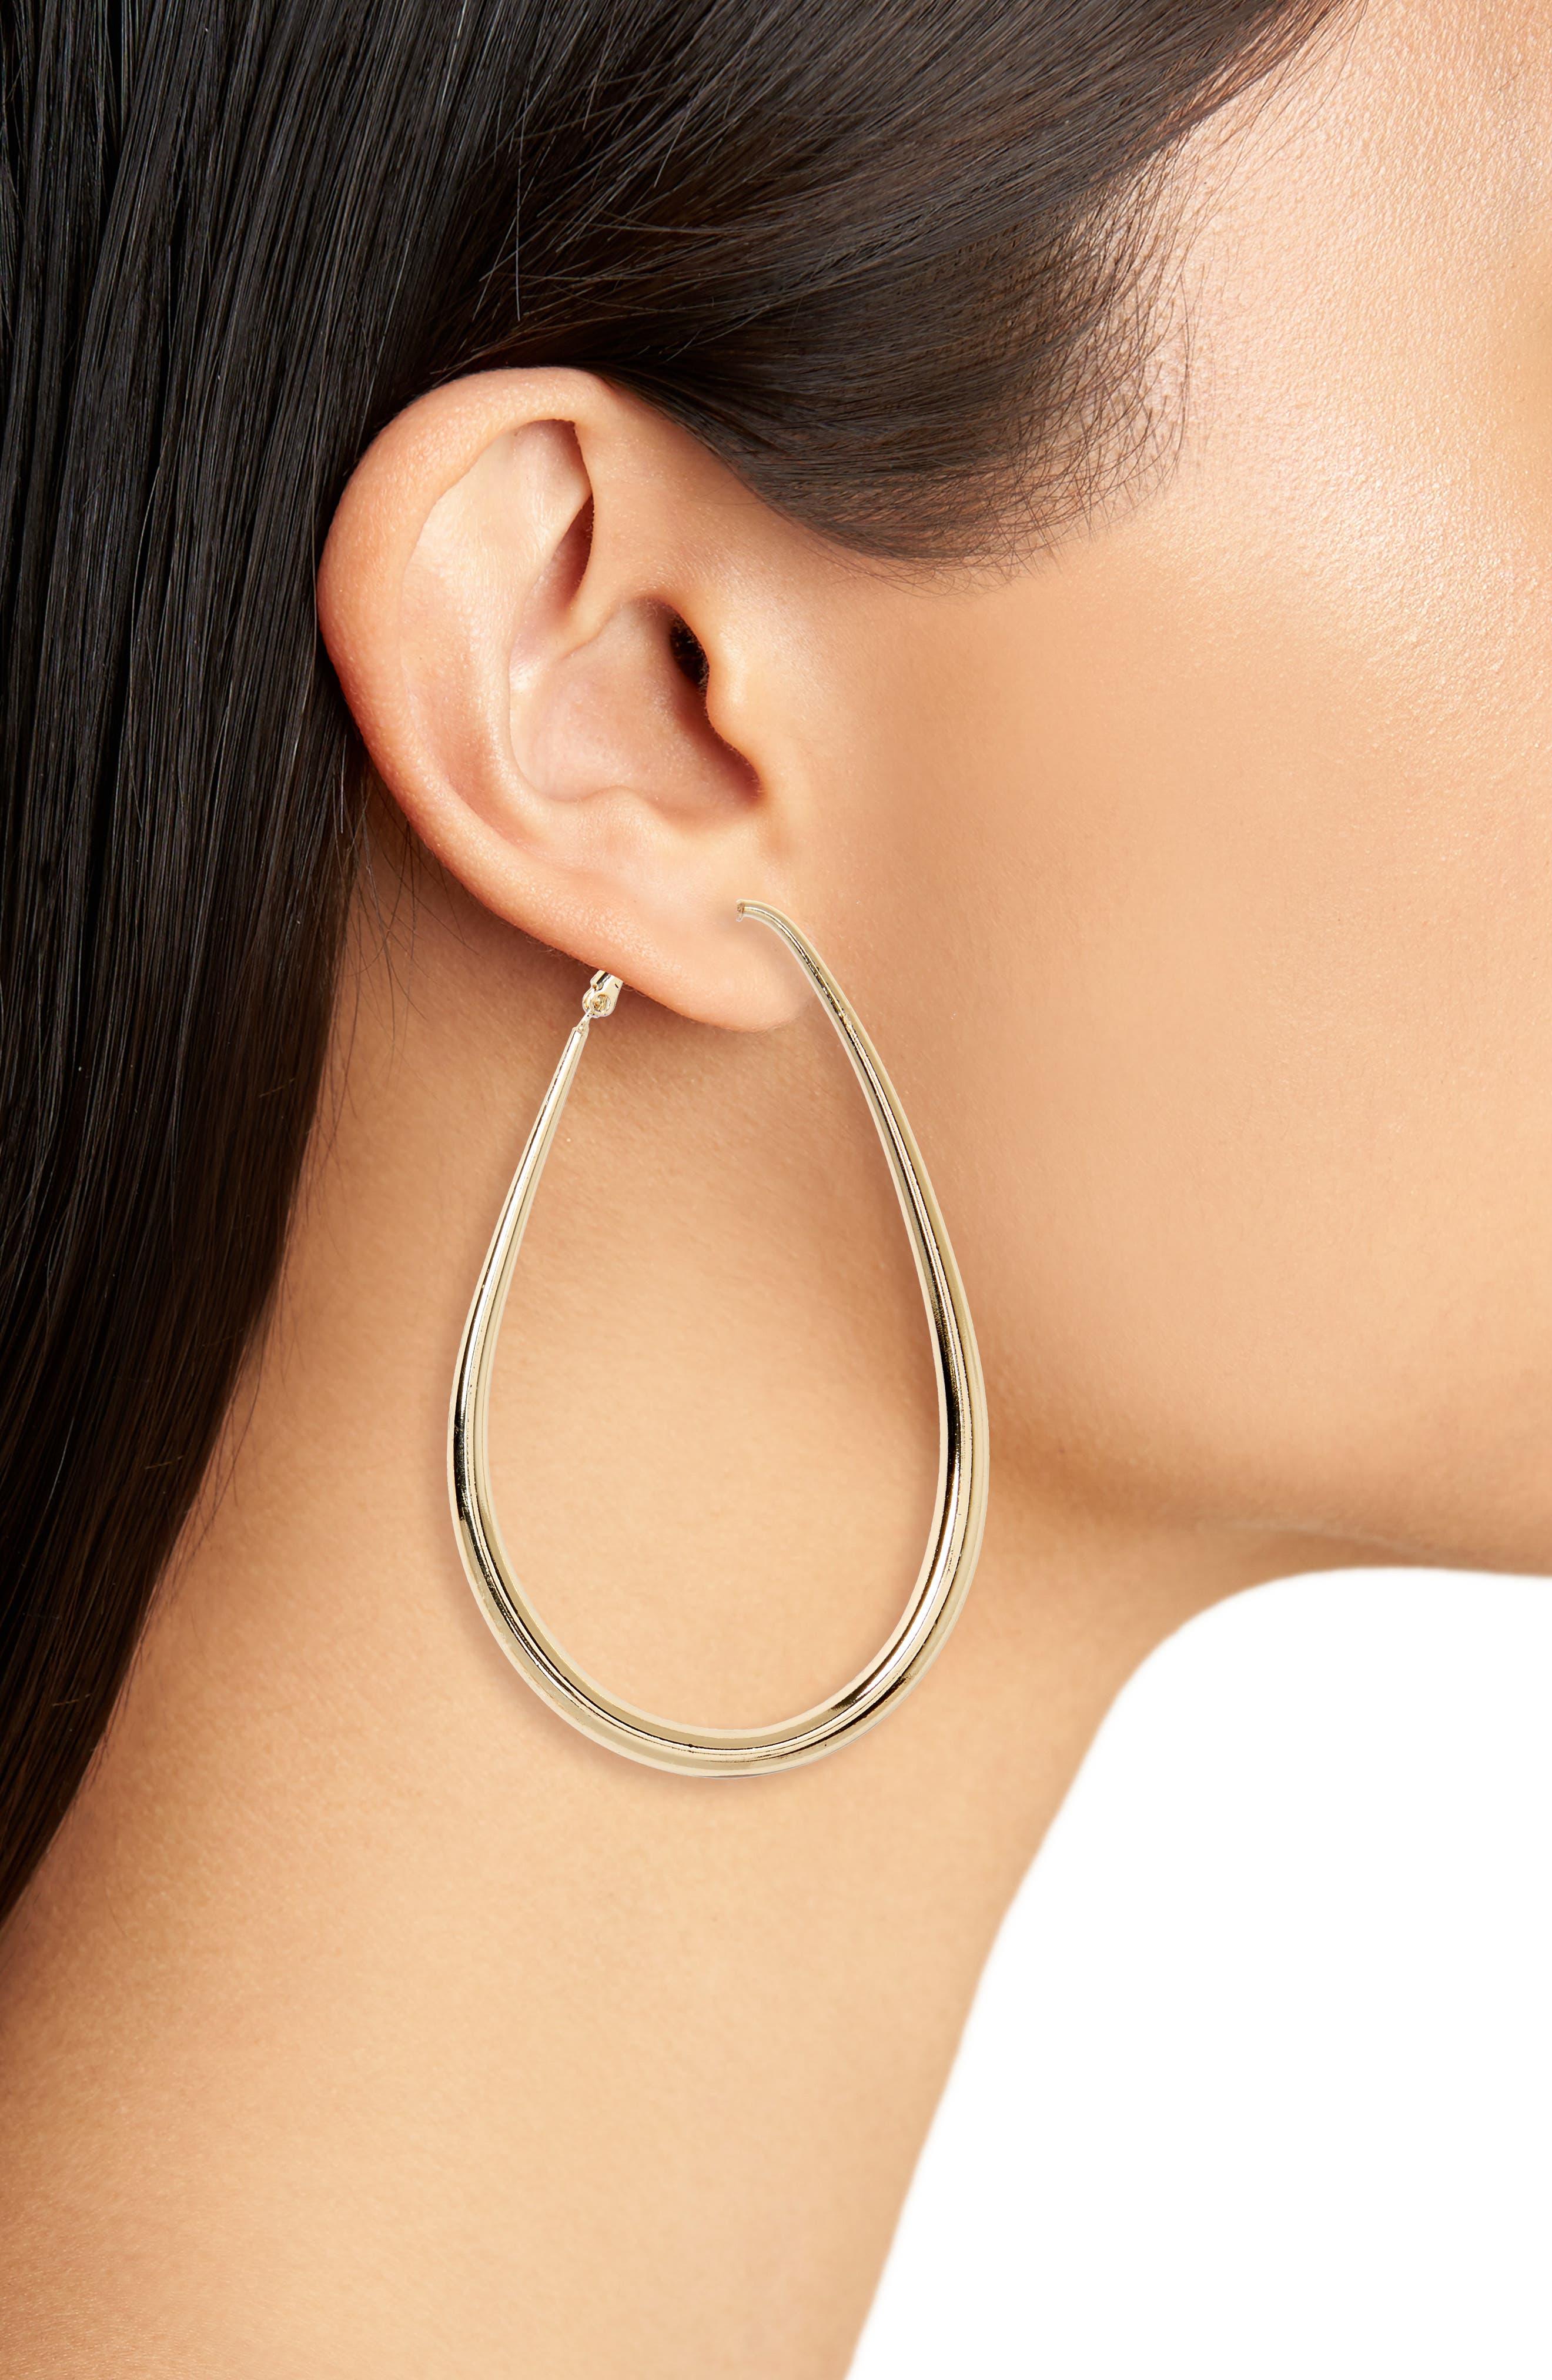 Large Oval Hoop Earrings,                             Alternate thumbnail 2, color,                             710